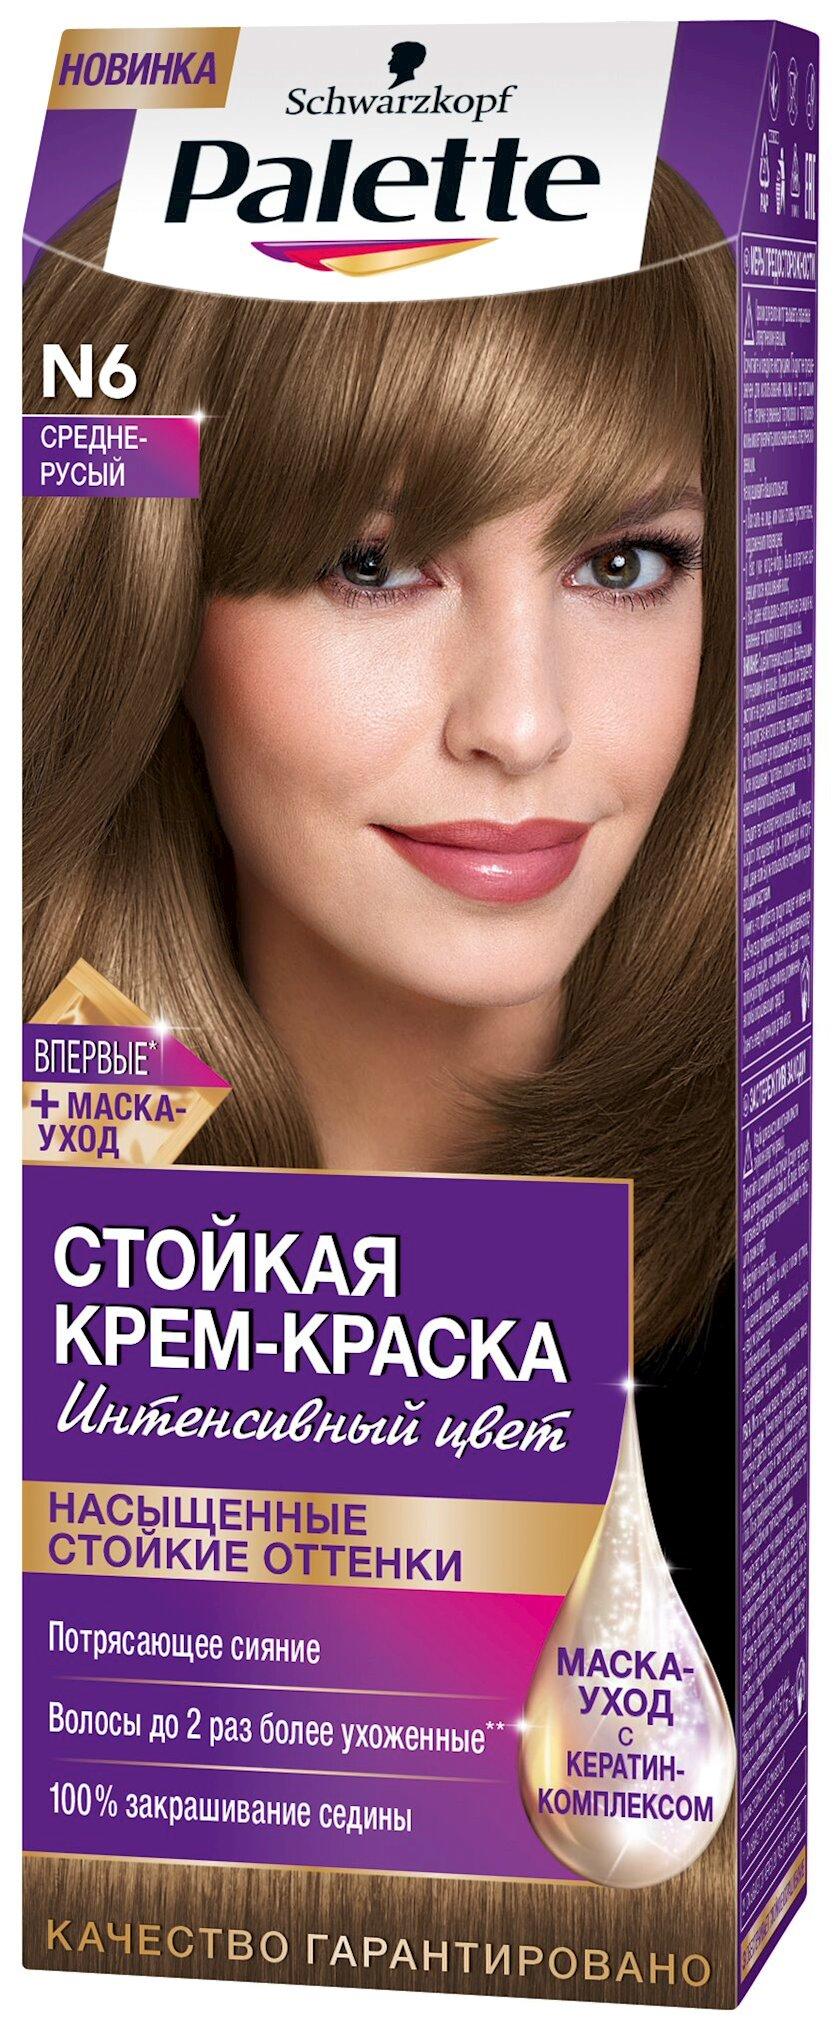 Davamlı krem-boya Palette N6 7-0 Orta xurmayı